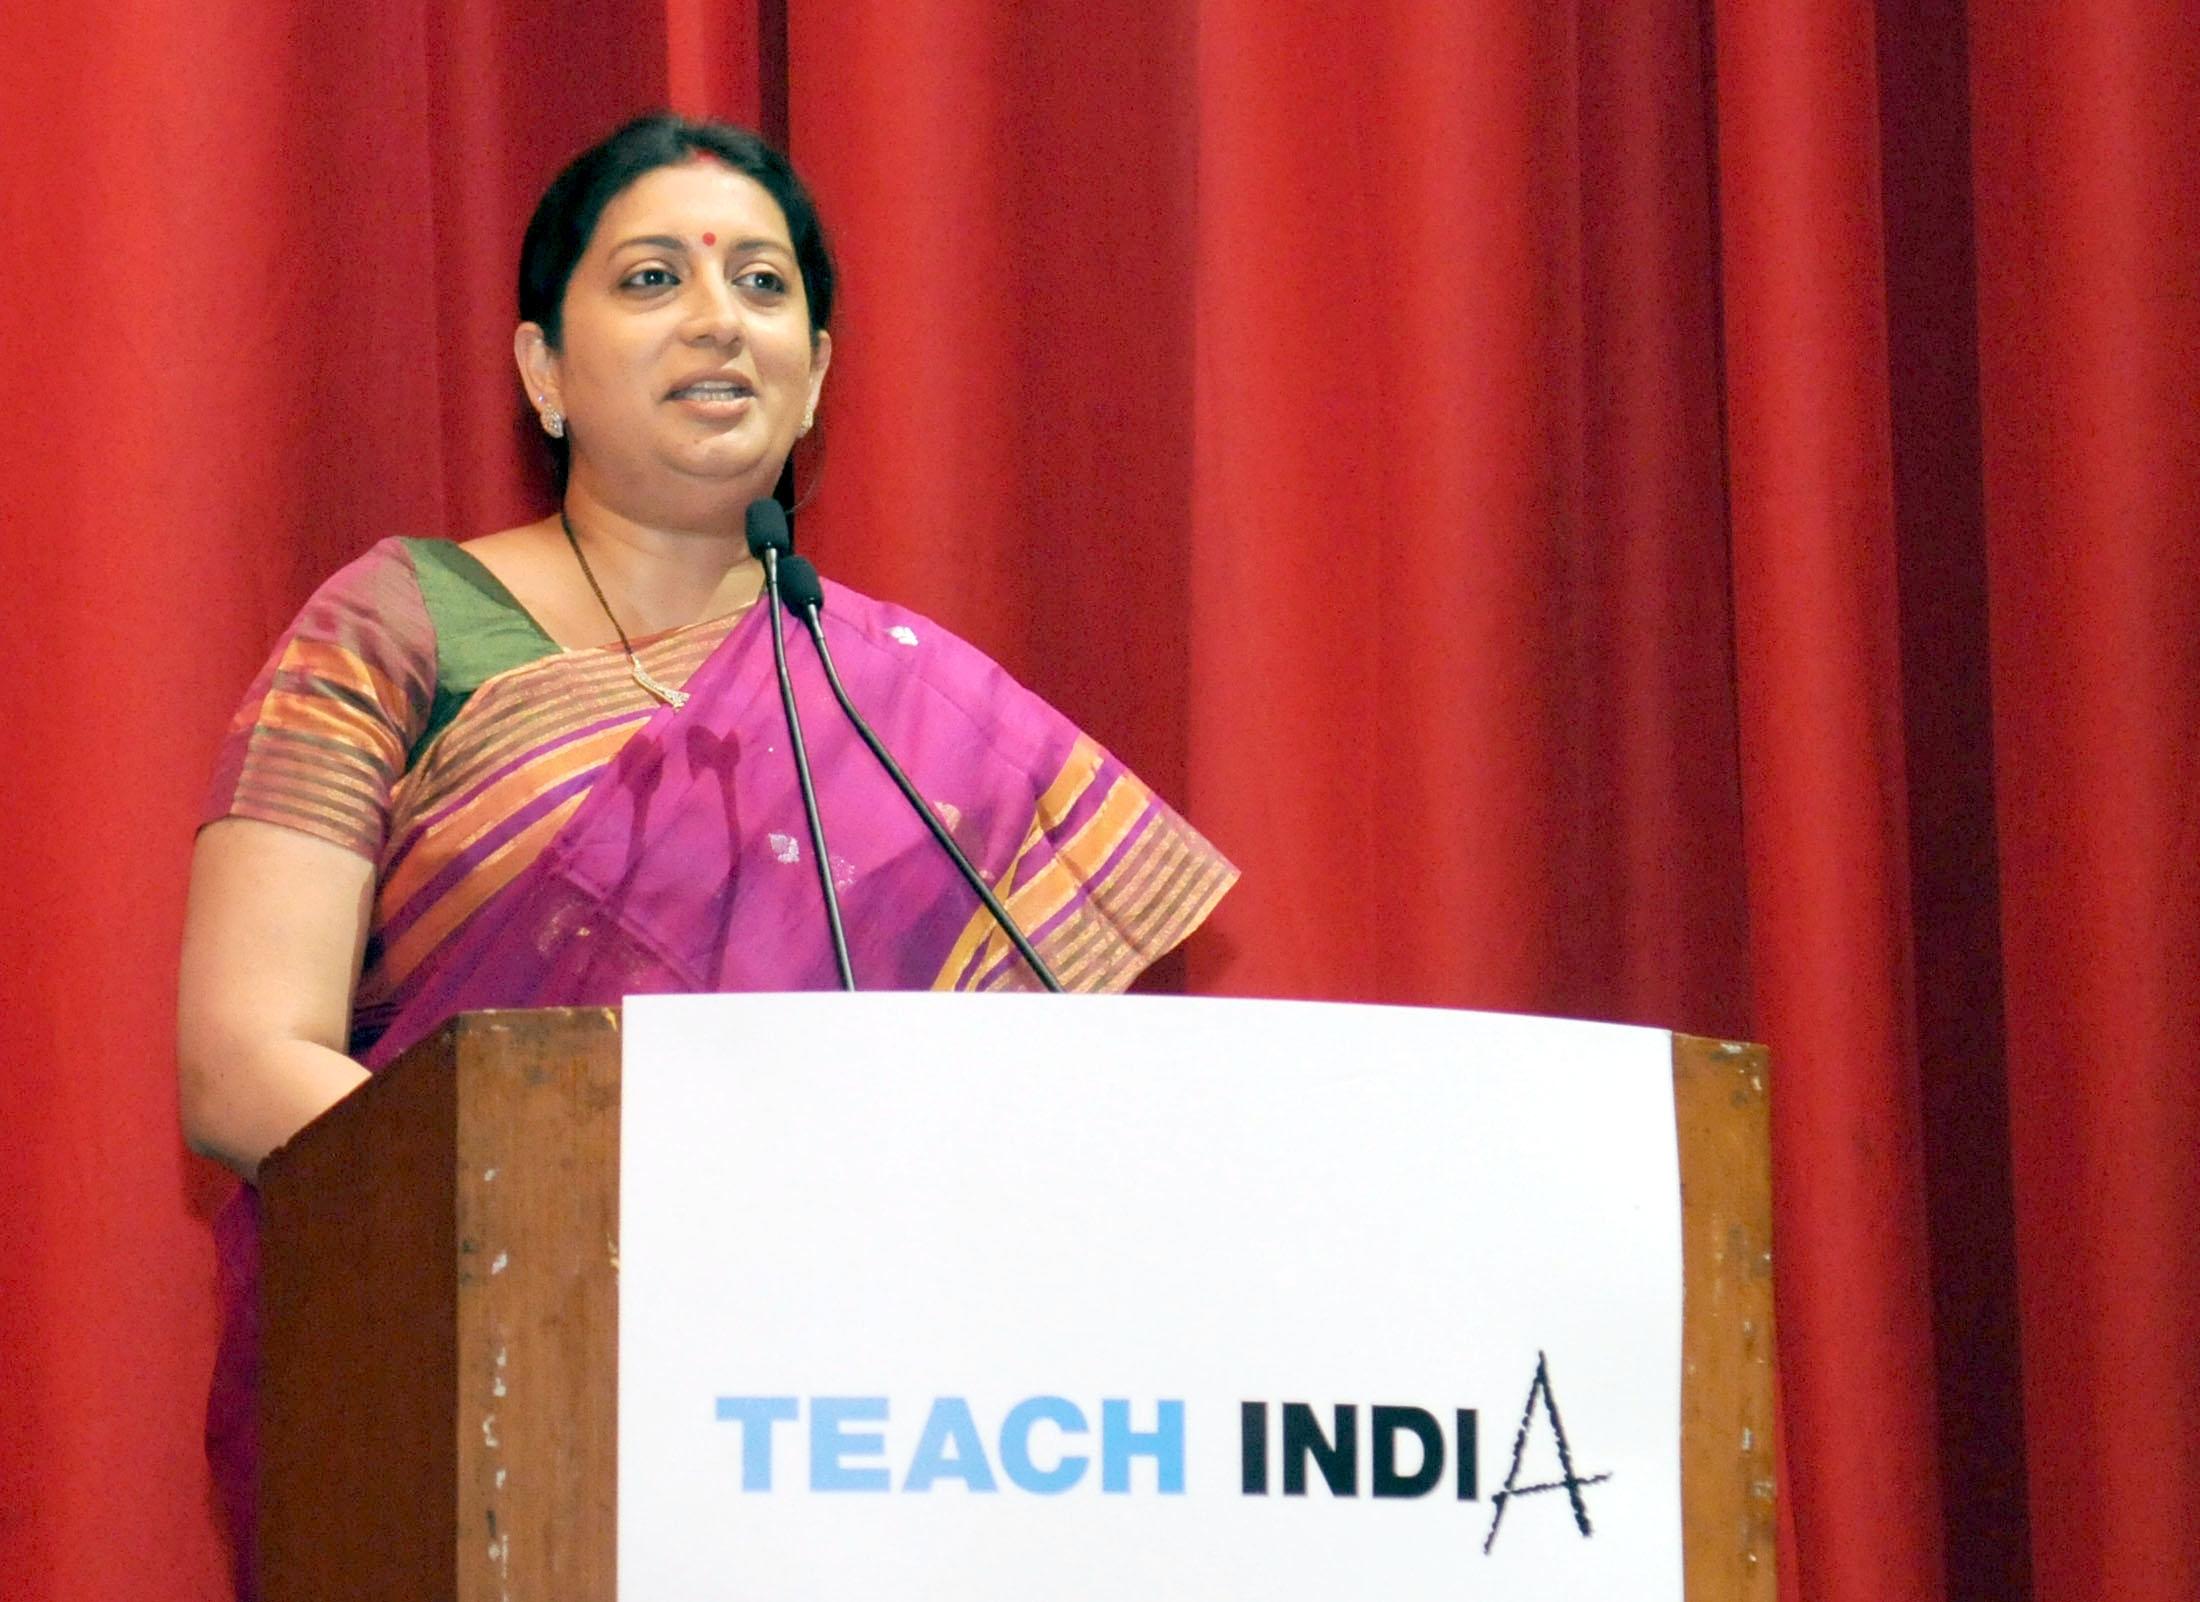 New Delhi: Union Human Resource Development Minister Smriti Irani addresses the Times Group's Corporate Social Responsibility (CSR) programme in New Delhi on June 10, 2015. (Photo: IANS/PIB)